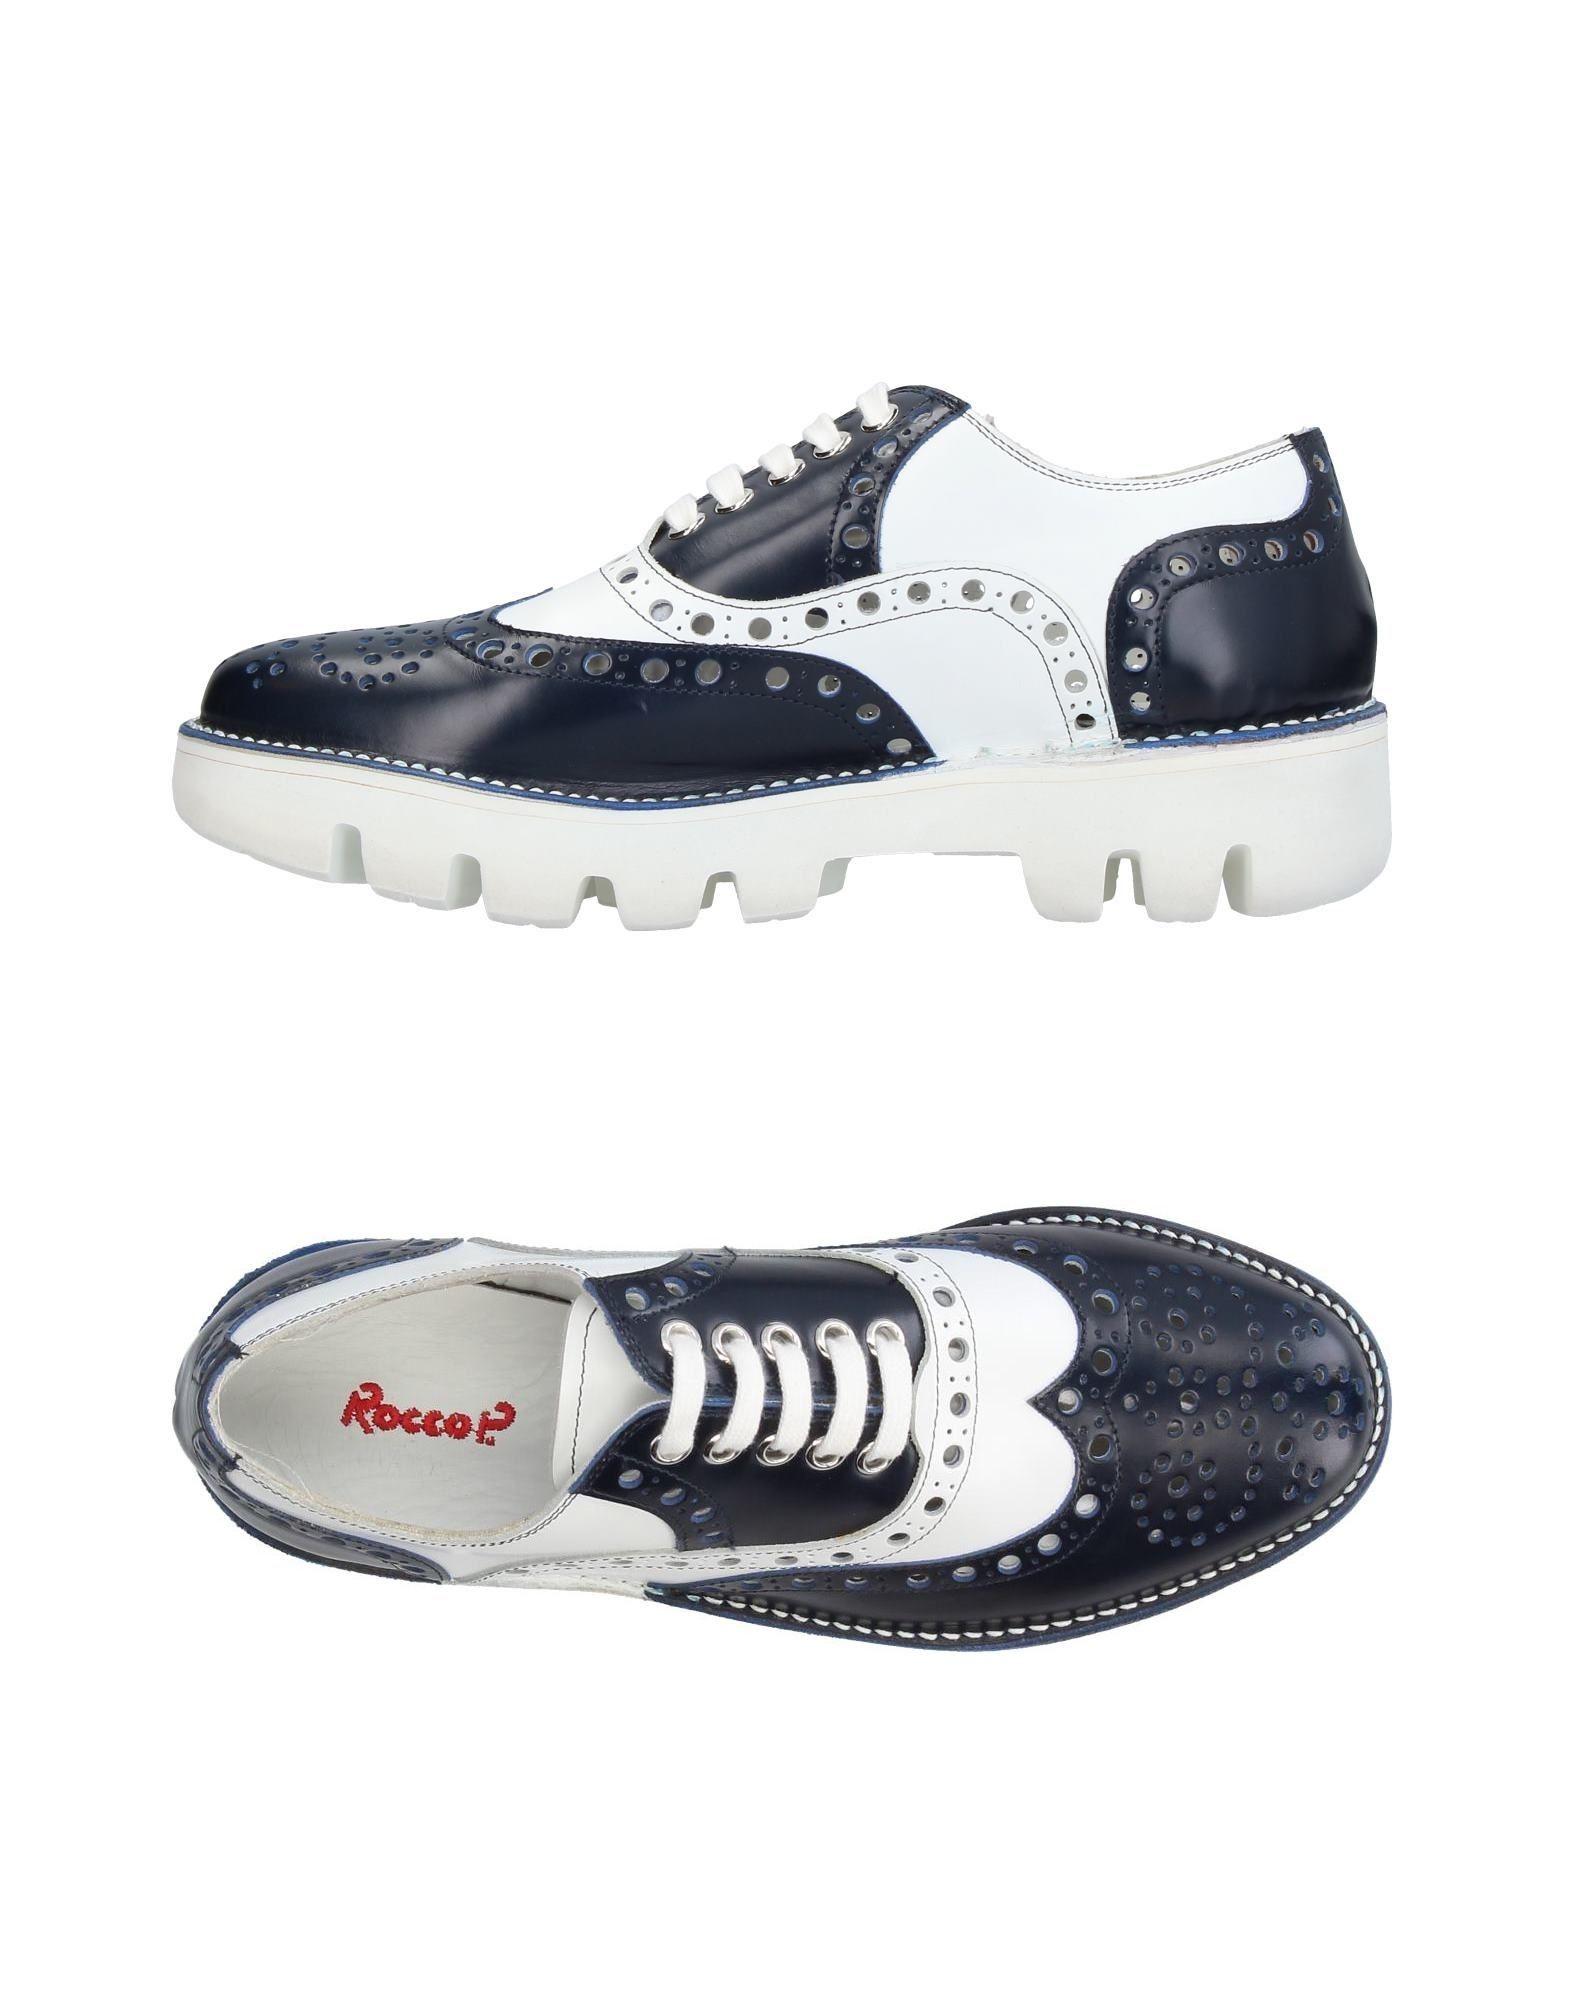 Rocco P. Schnürschuhe Damen  11410164DP Gute Qualität beliebte Schuhe